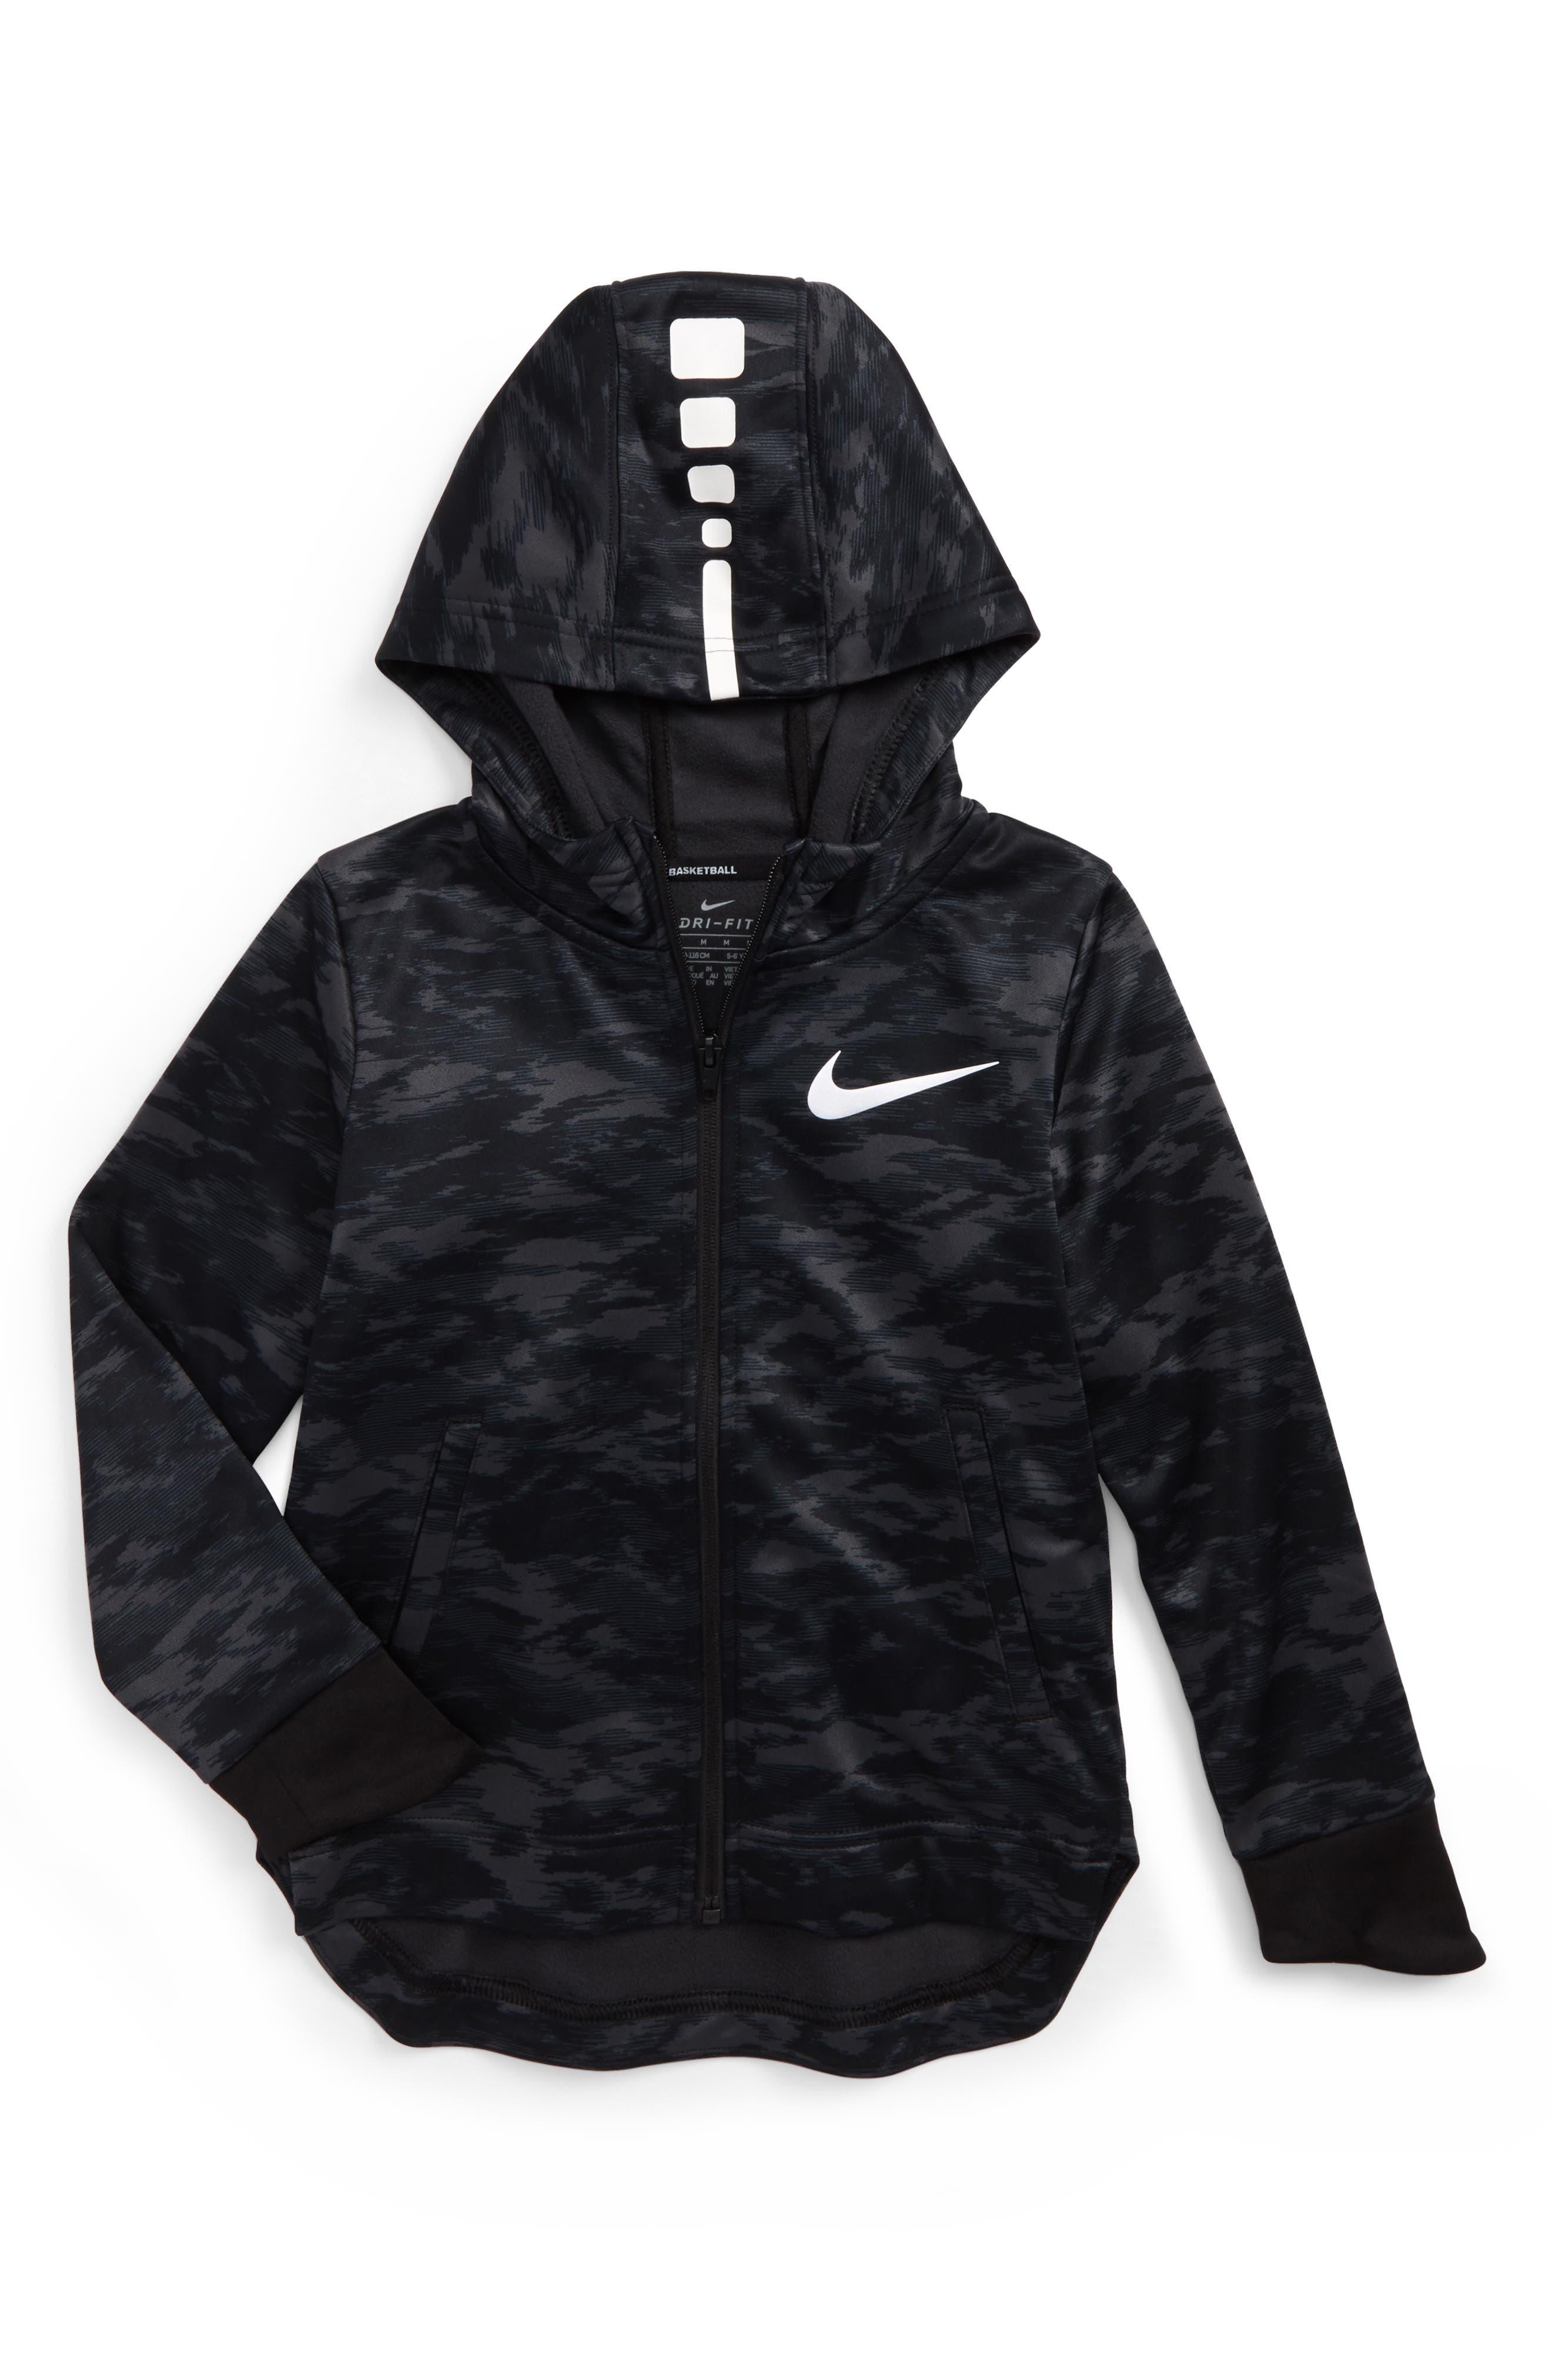 Main Image - Nike Elite Therma Zip Hoodie (Toddler Boys & Little Boys)